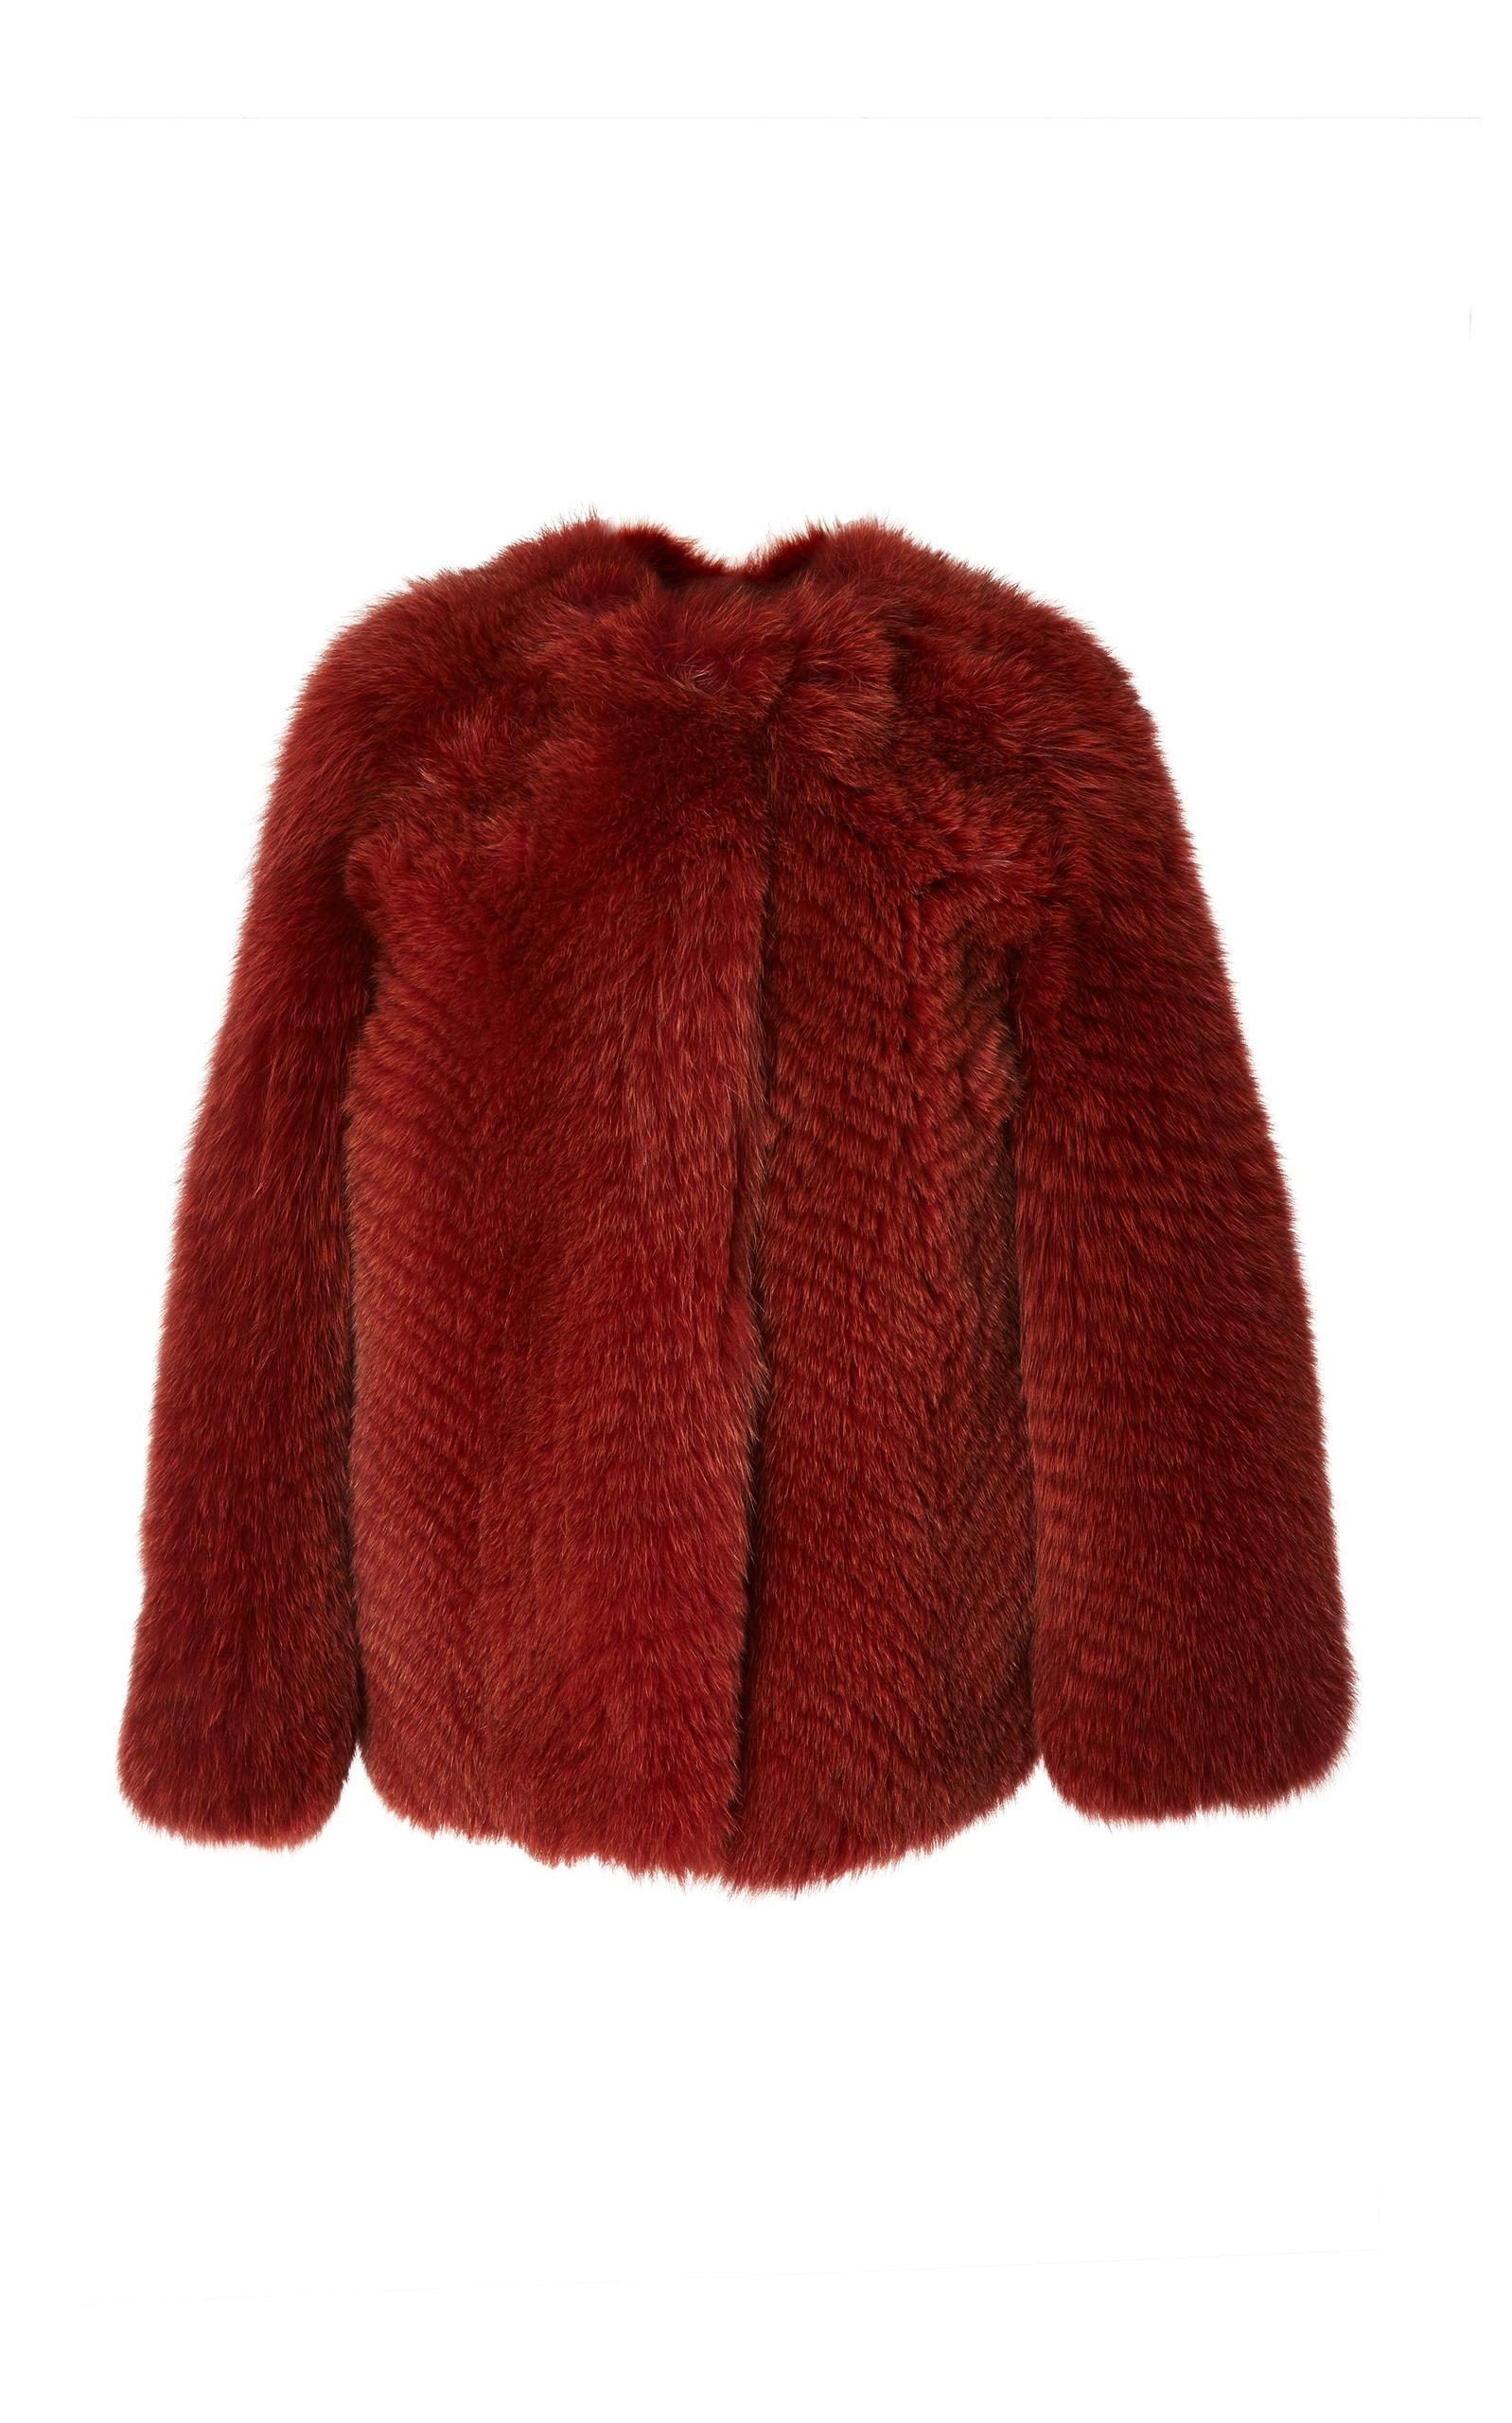 ffec6e1e4 Collarless Fox Fur Jacket by Zeynep Arçay   Moda Operandi